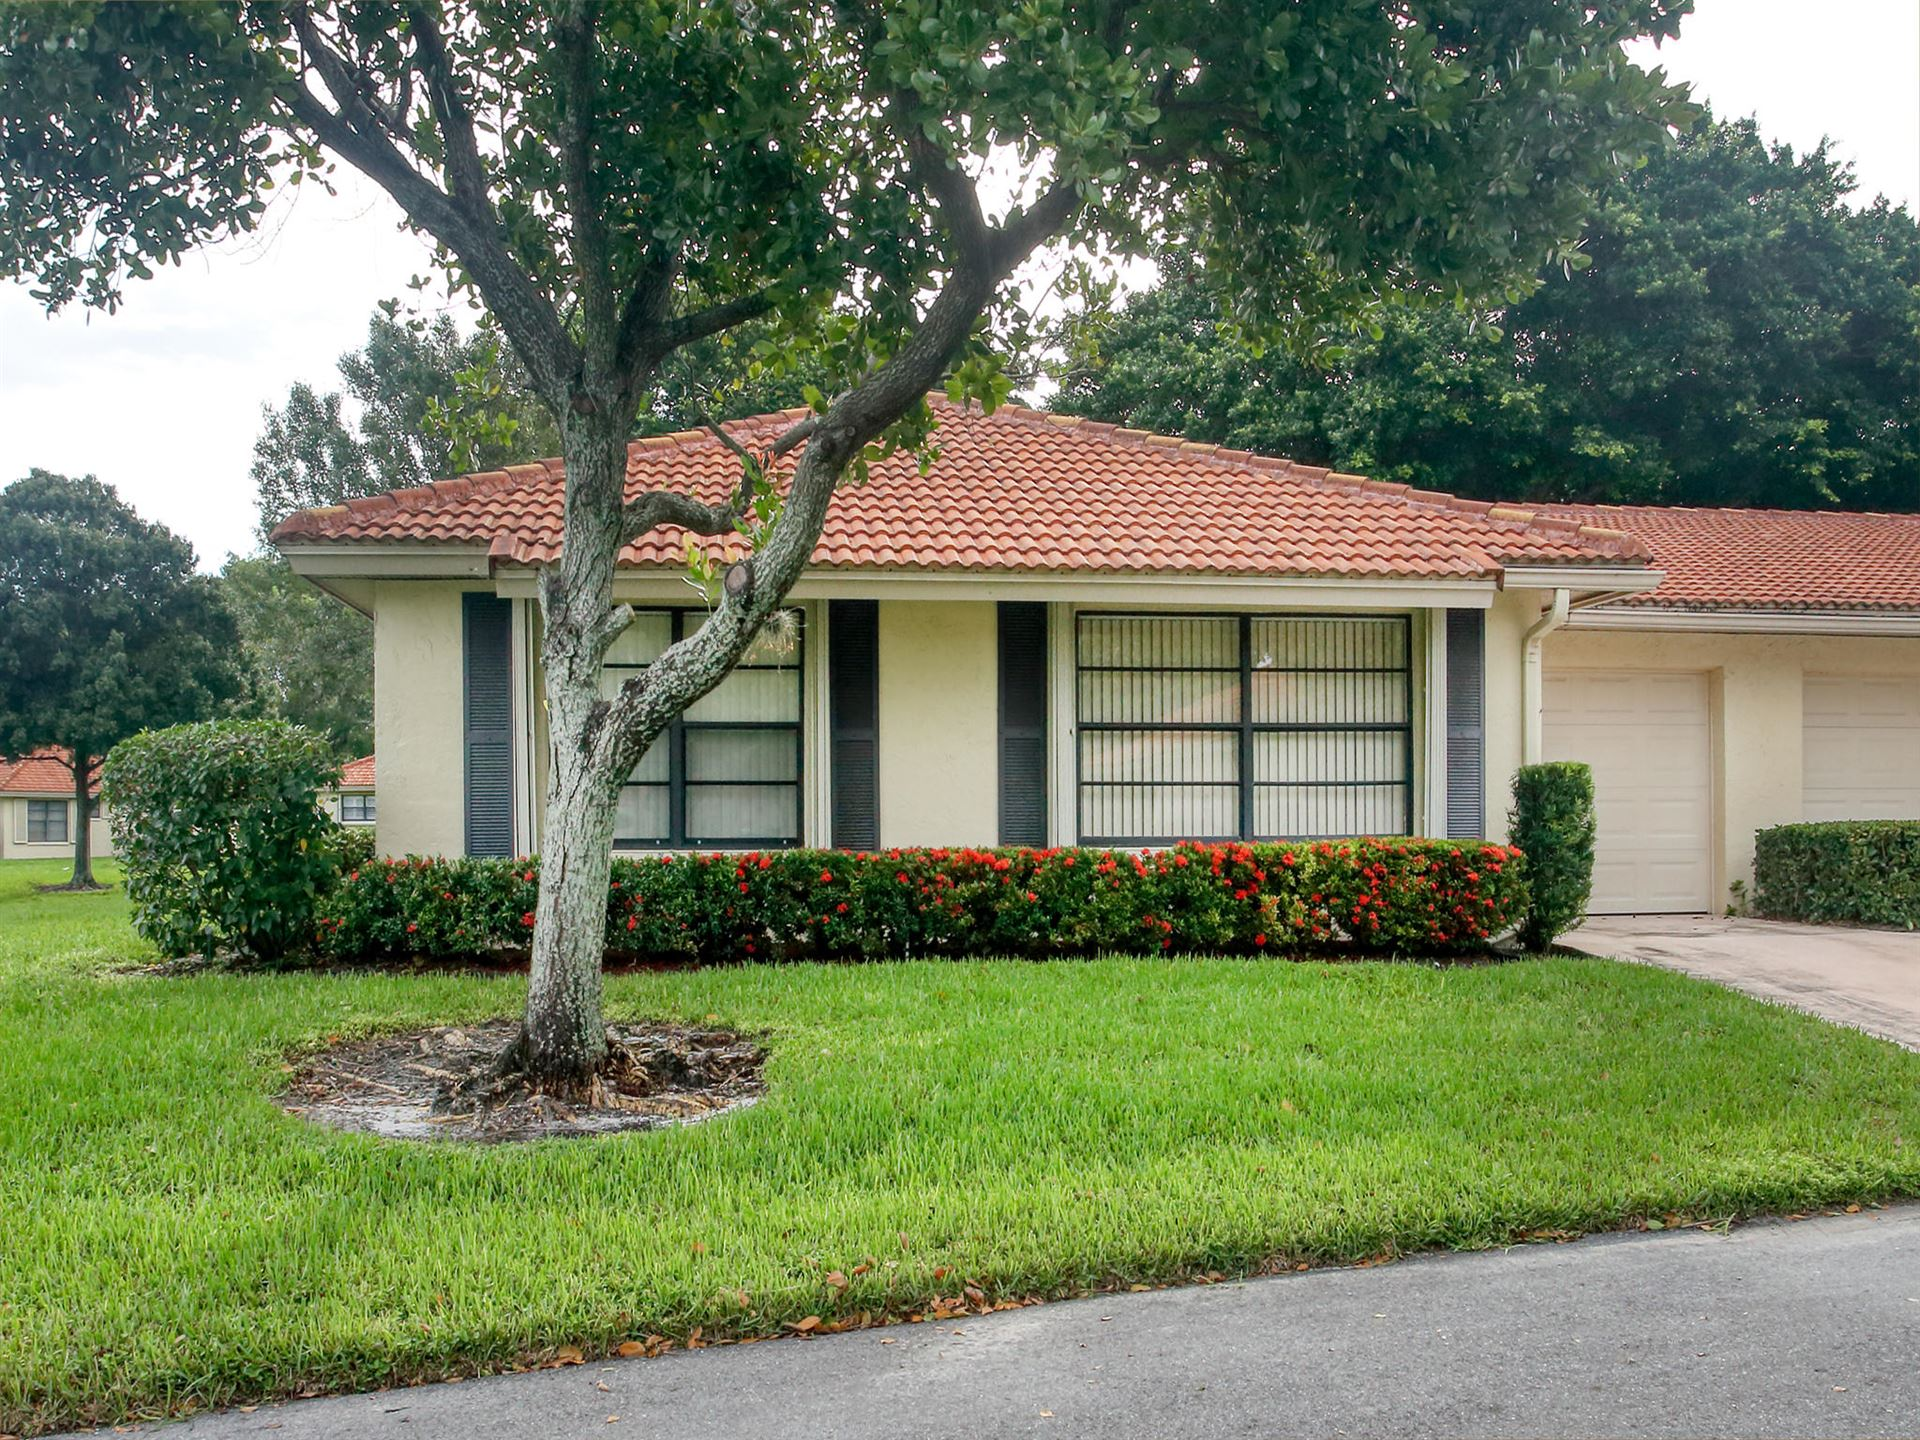 Photo of 4570 Rosewood Tree Court #A, Boynton Beach, FL 33436 (MLS # RX-10655156)